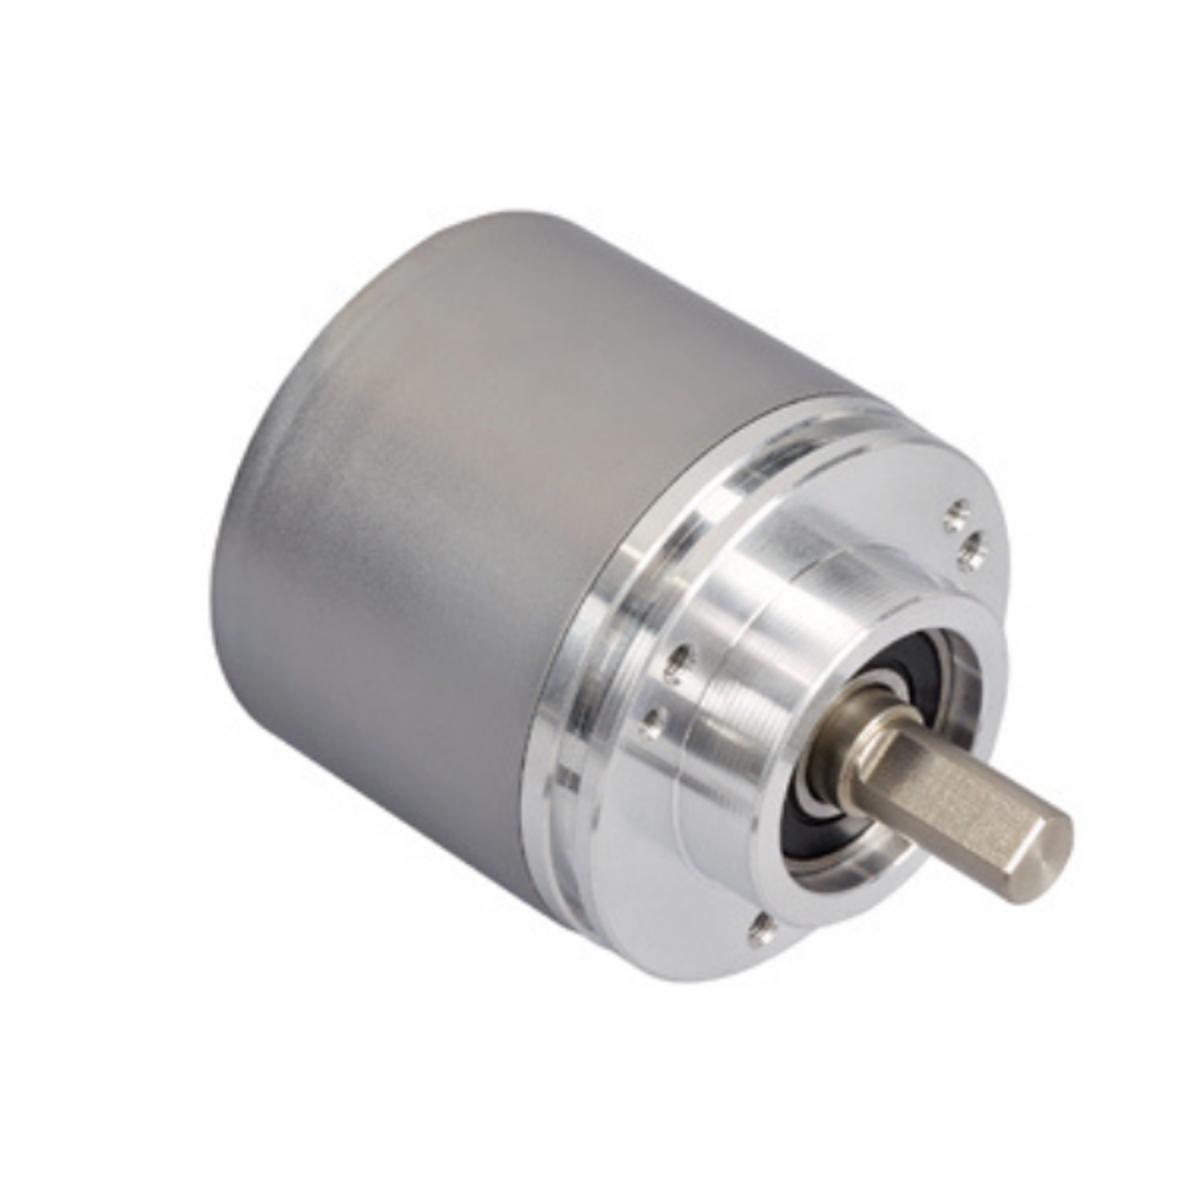 POSITAL UCD-IPH00-01024-L10S-PAQ Incremental Encoder